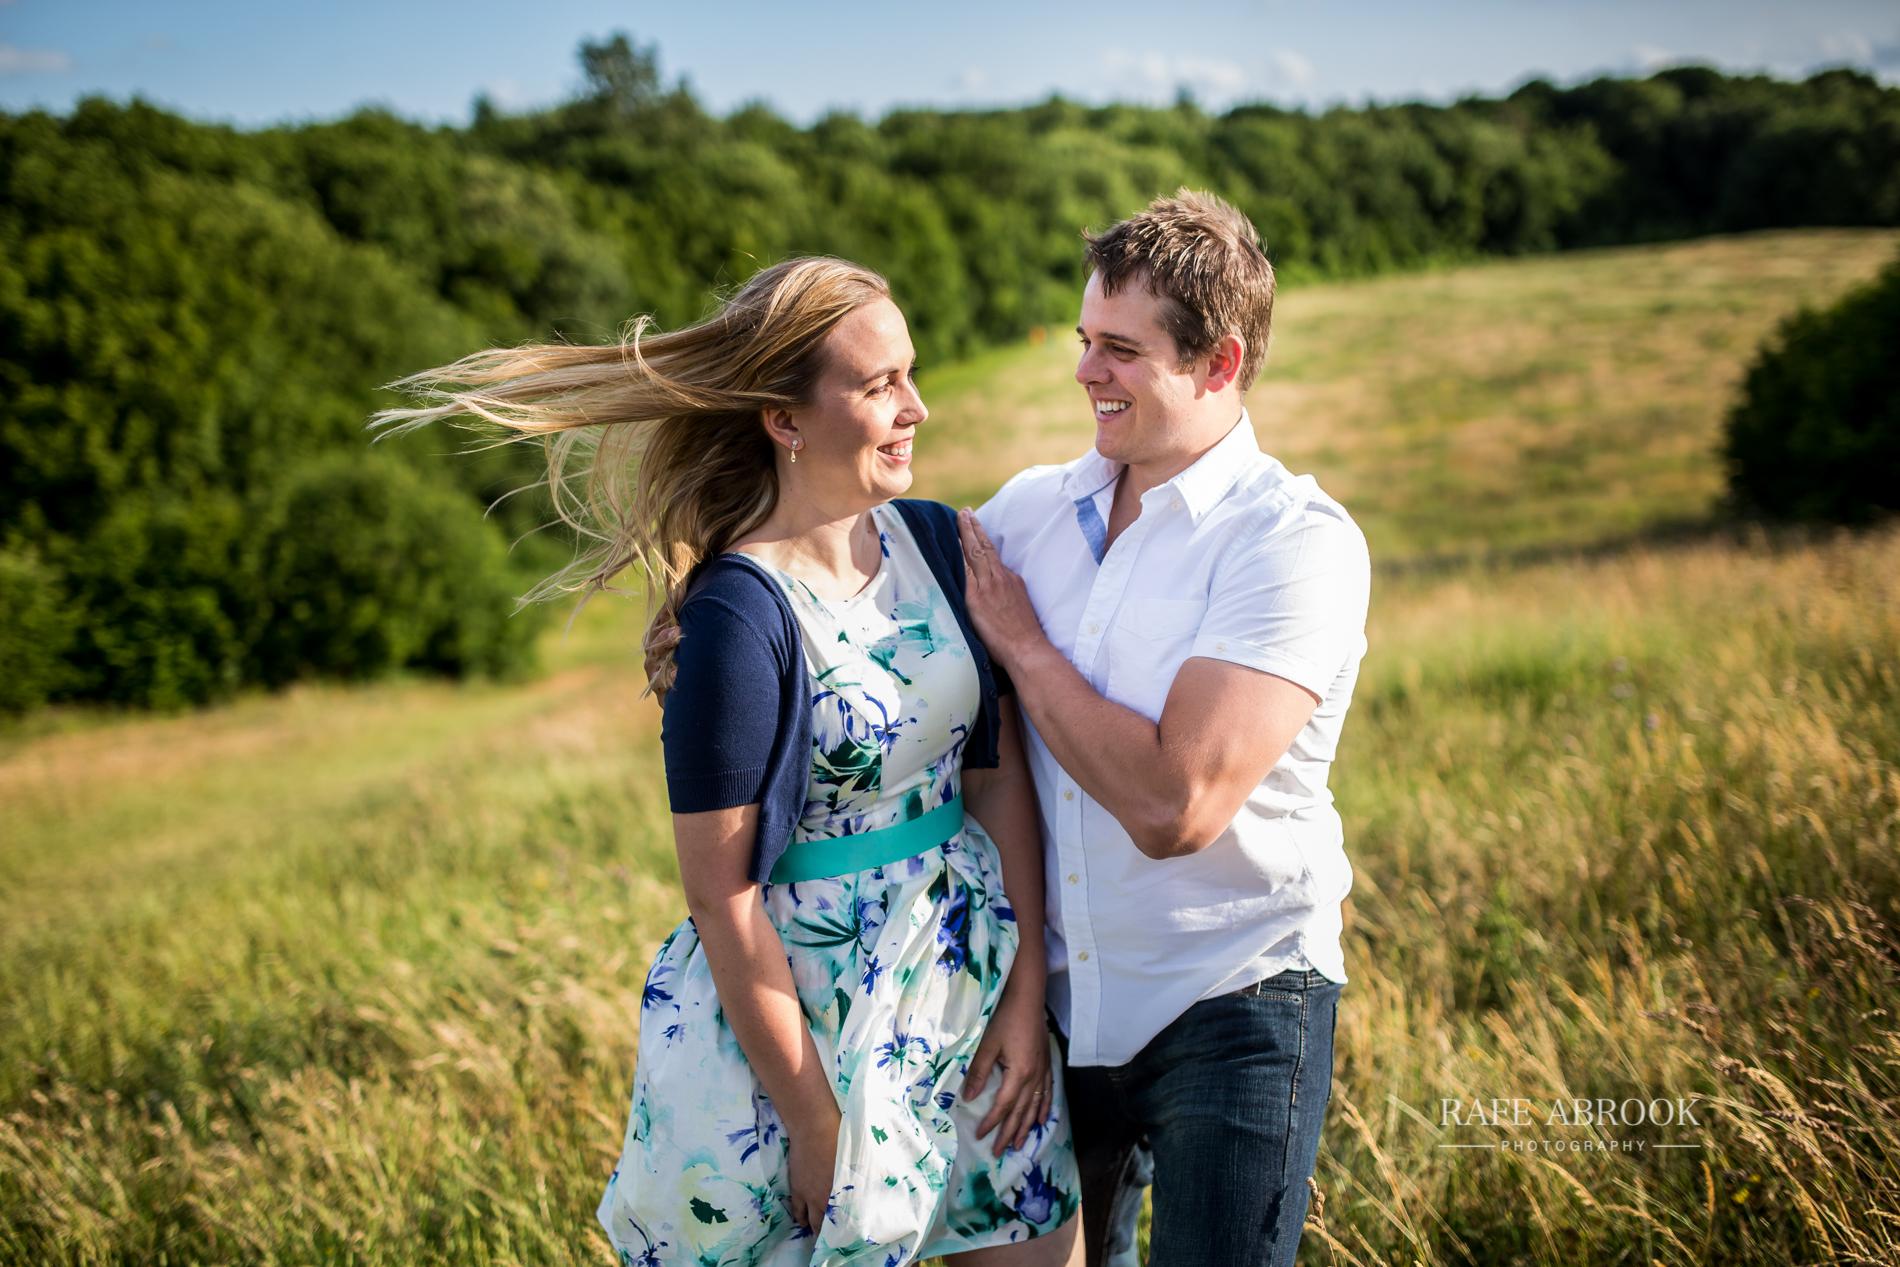 melanie & graham engagement shoot great ashby district park stevenage hertfordshire-1009.jpg